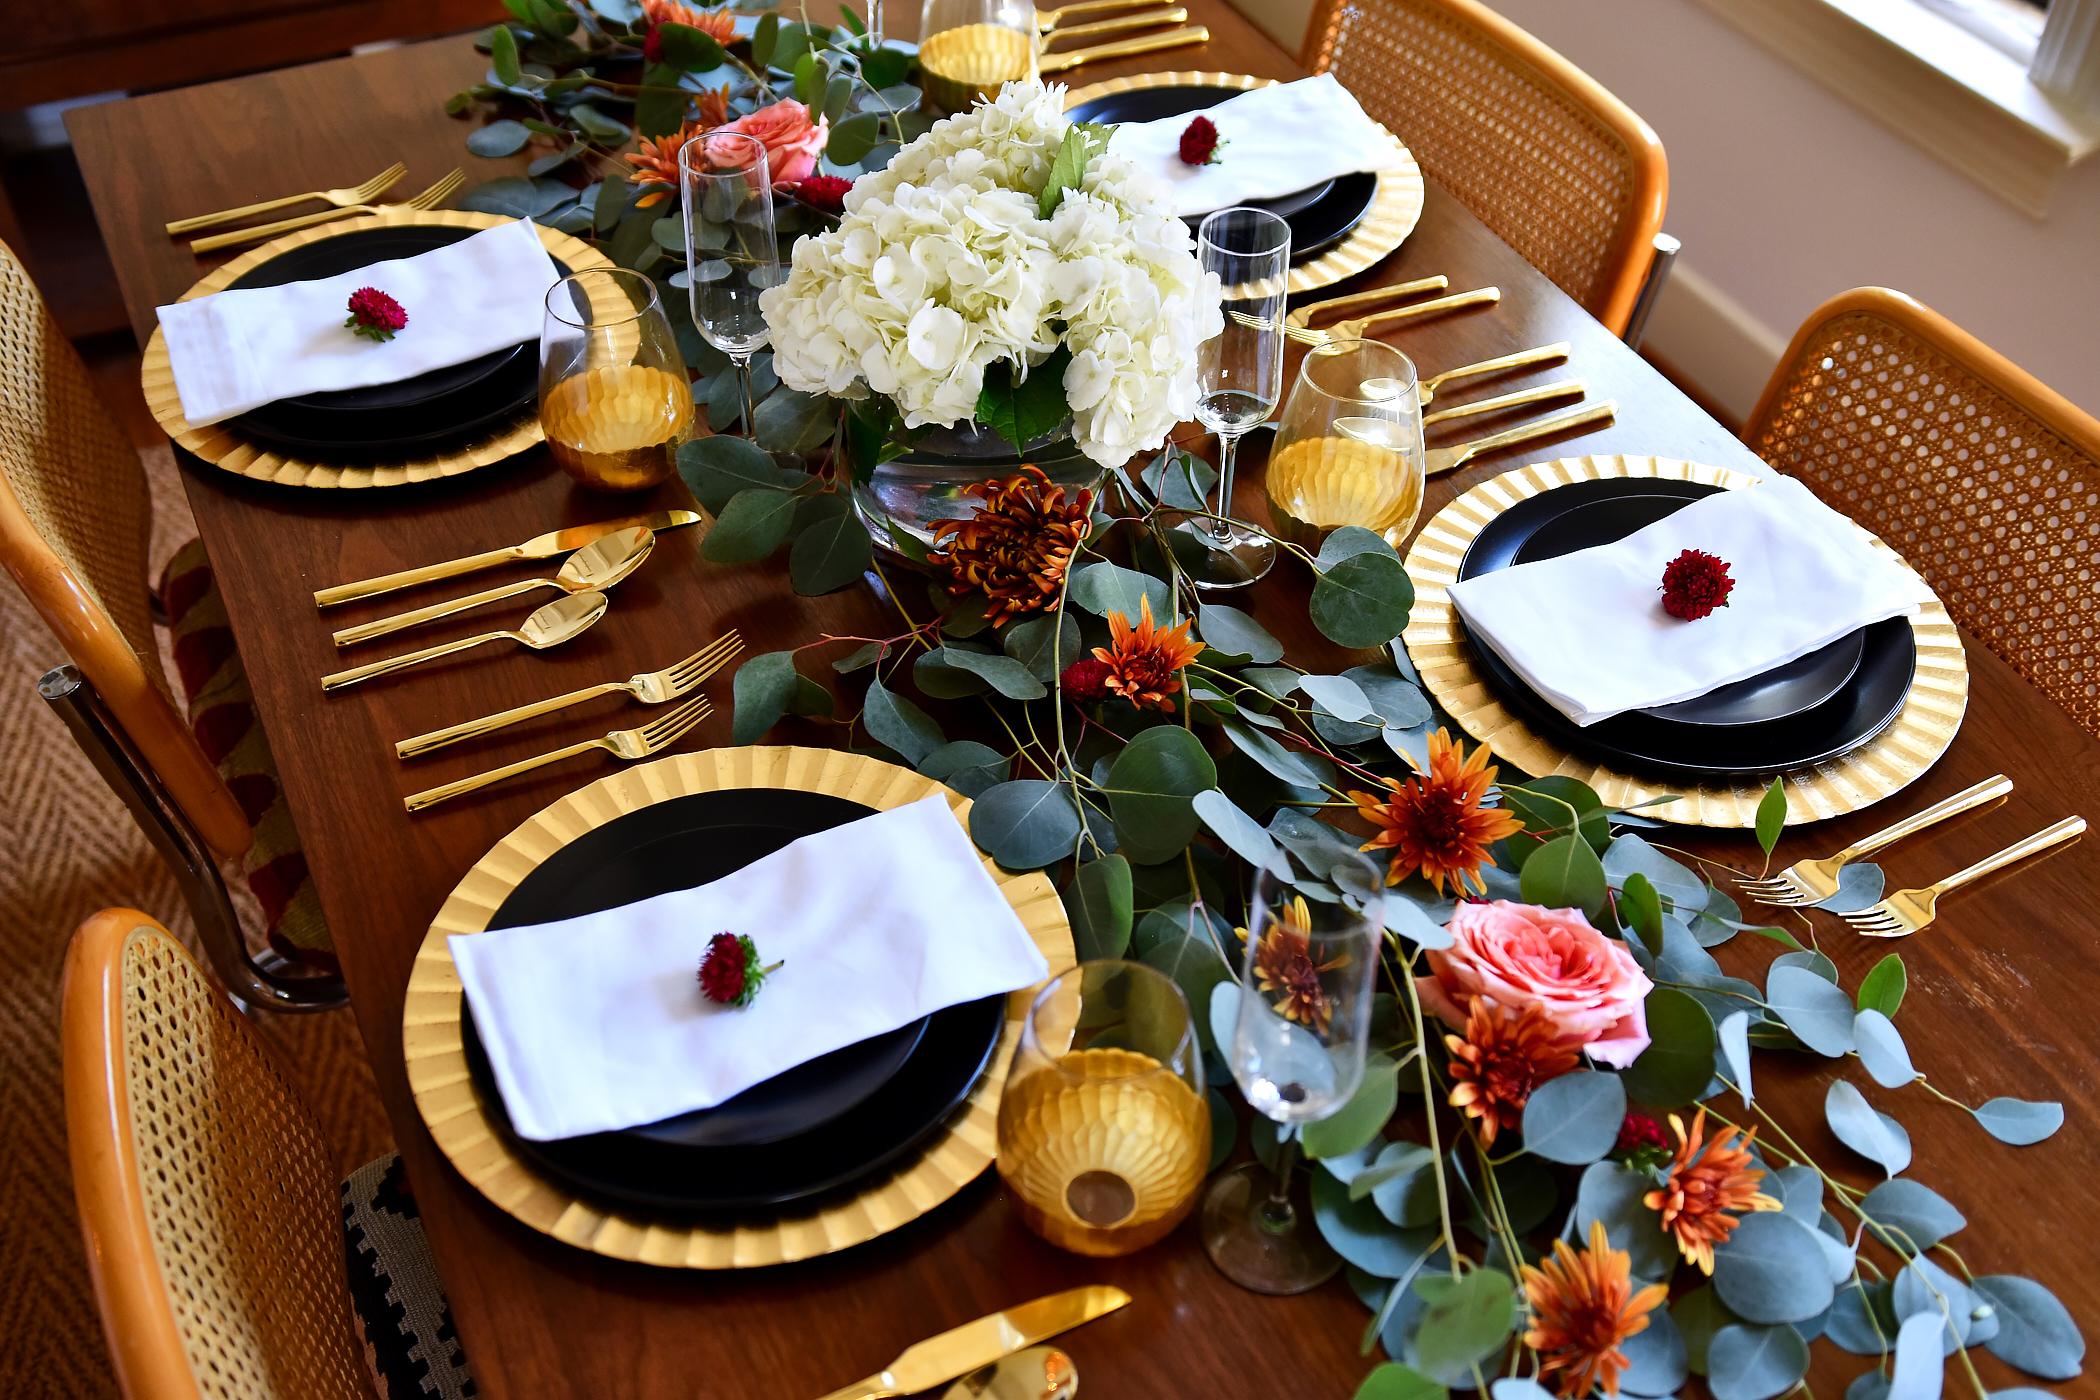 Thanksgiving Tablescape Ideas, Modern Thanksgiving Setting, Black & Gold Dinner Setting, Eucalyptus, Fall Flowers